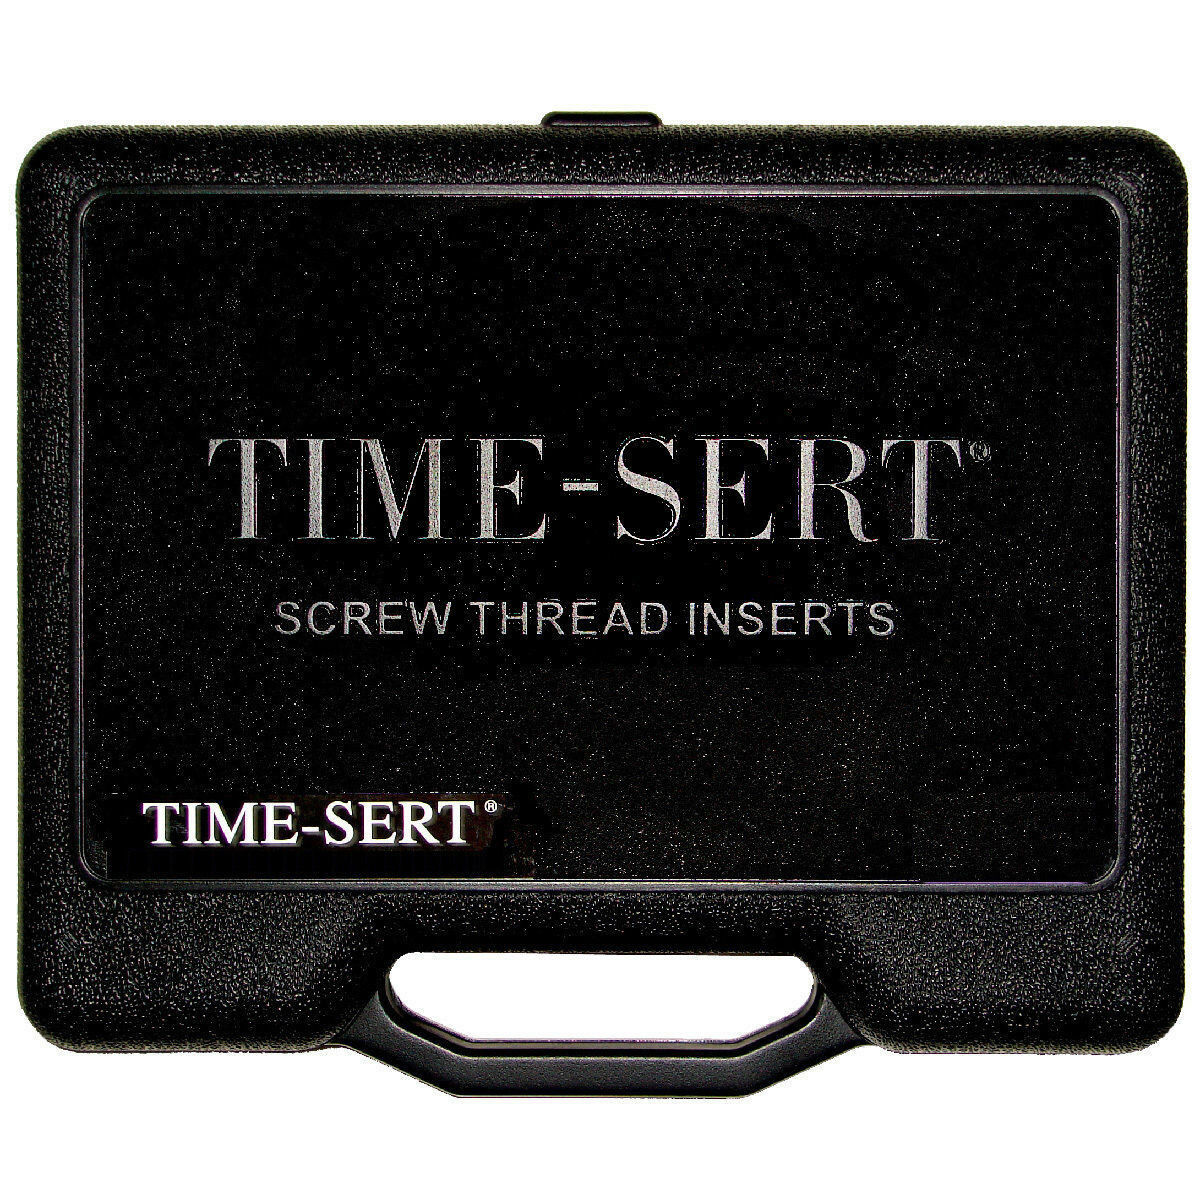 Time-Sert 2200 M11 x 1.5 Toyota Camry Rav4 Head Bolt Thread Repair Kit